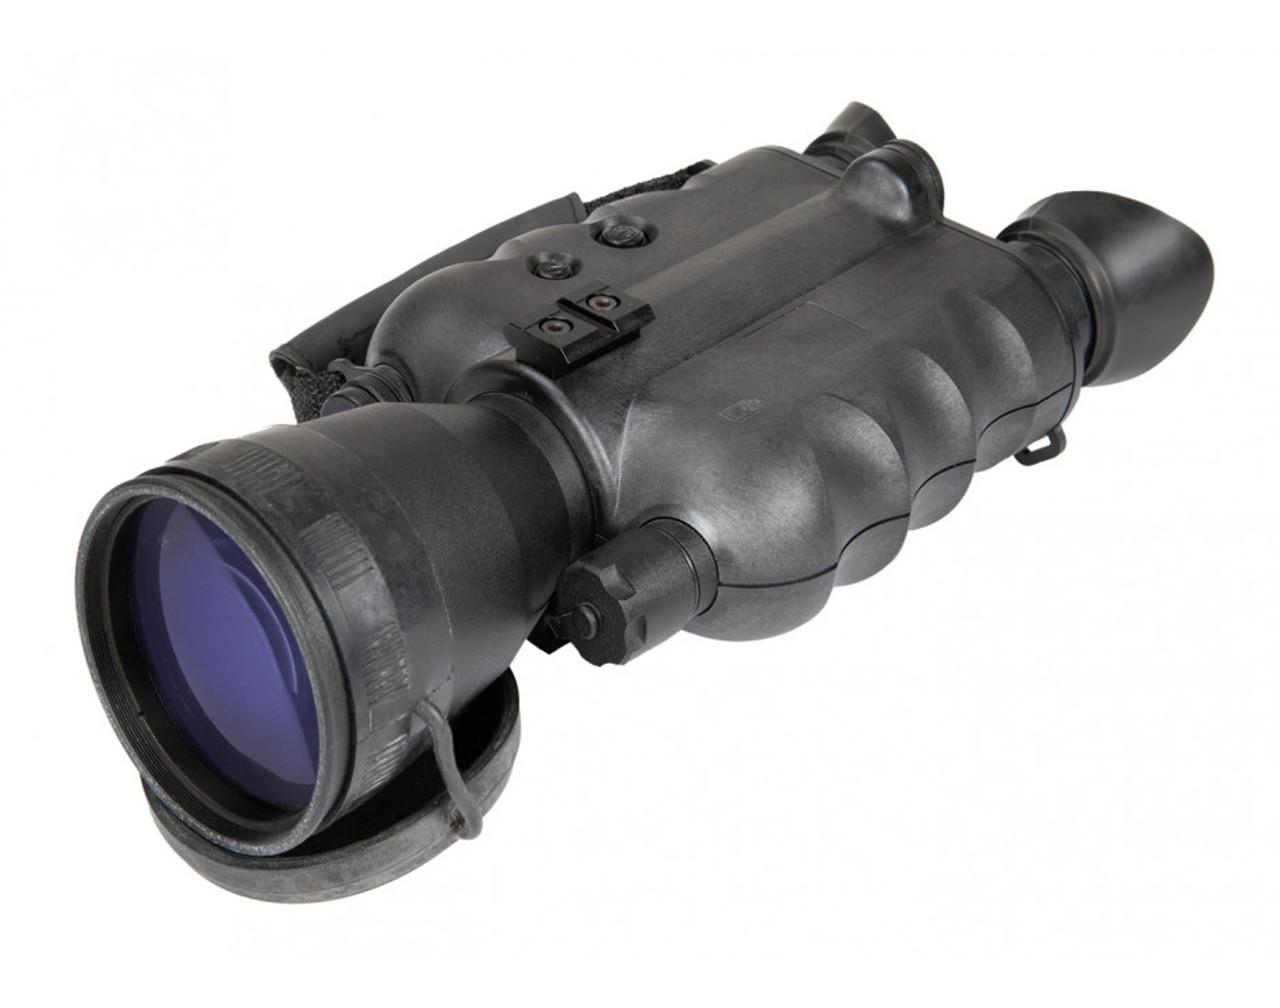 "AGM FoxBat-5 NL3 Night Vision Bi-Ocular 5x Gen 2+ ""Level 3"" with Sioux850 Long-Range Infrared Illuminator ( AGM FOXBAT-5 NL3)"